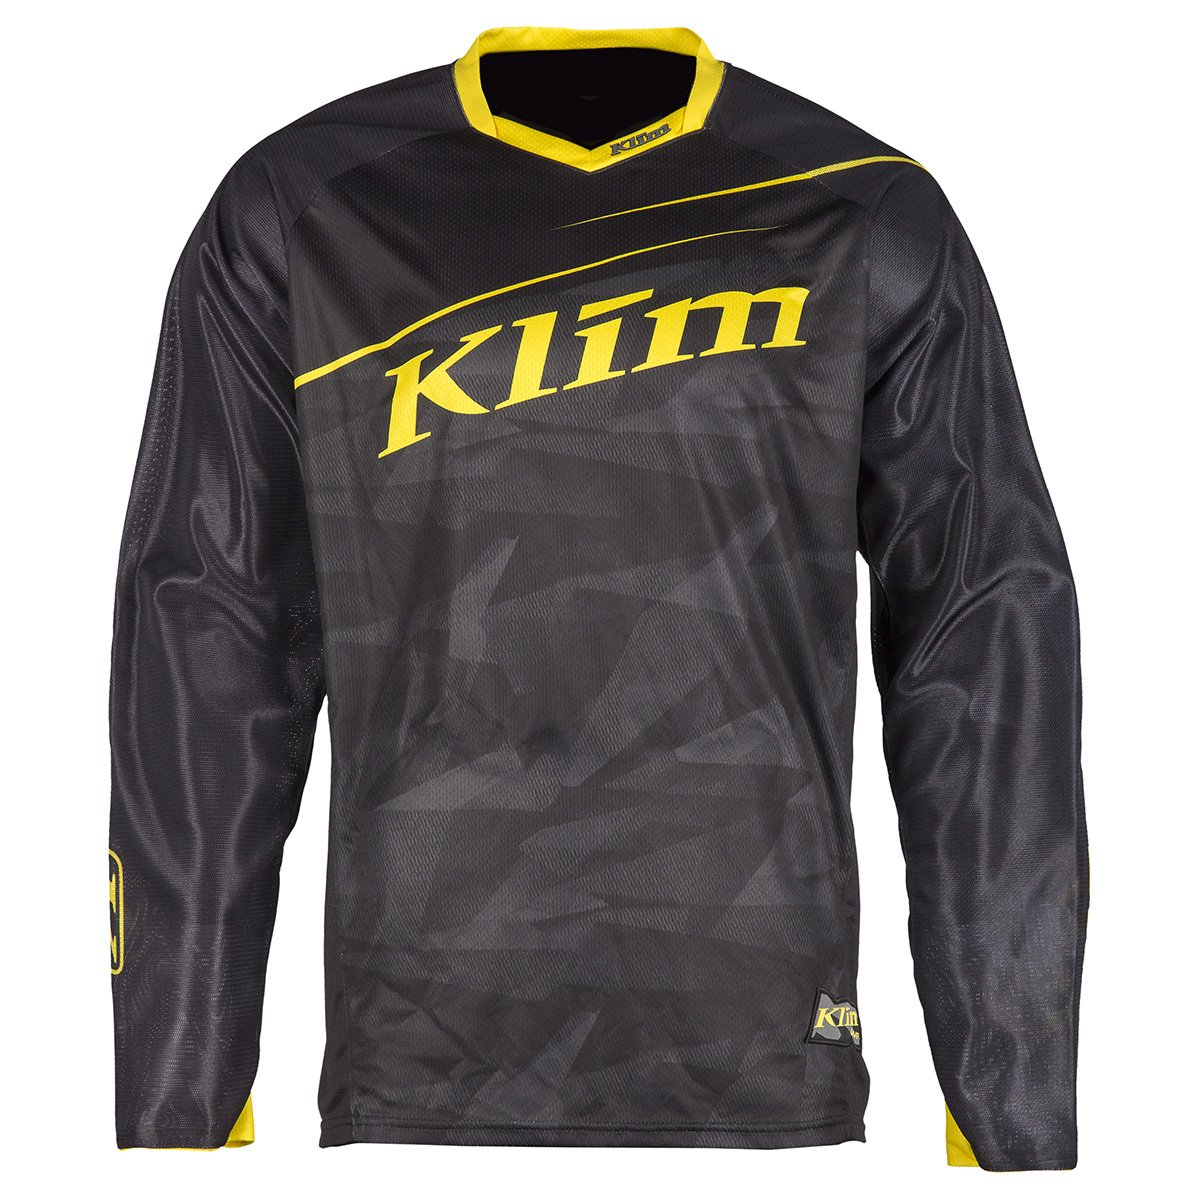 Klim Dakar Jersey - XL/Black